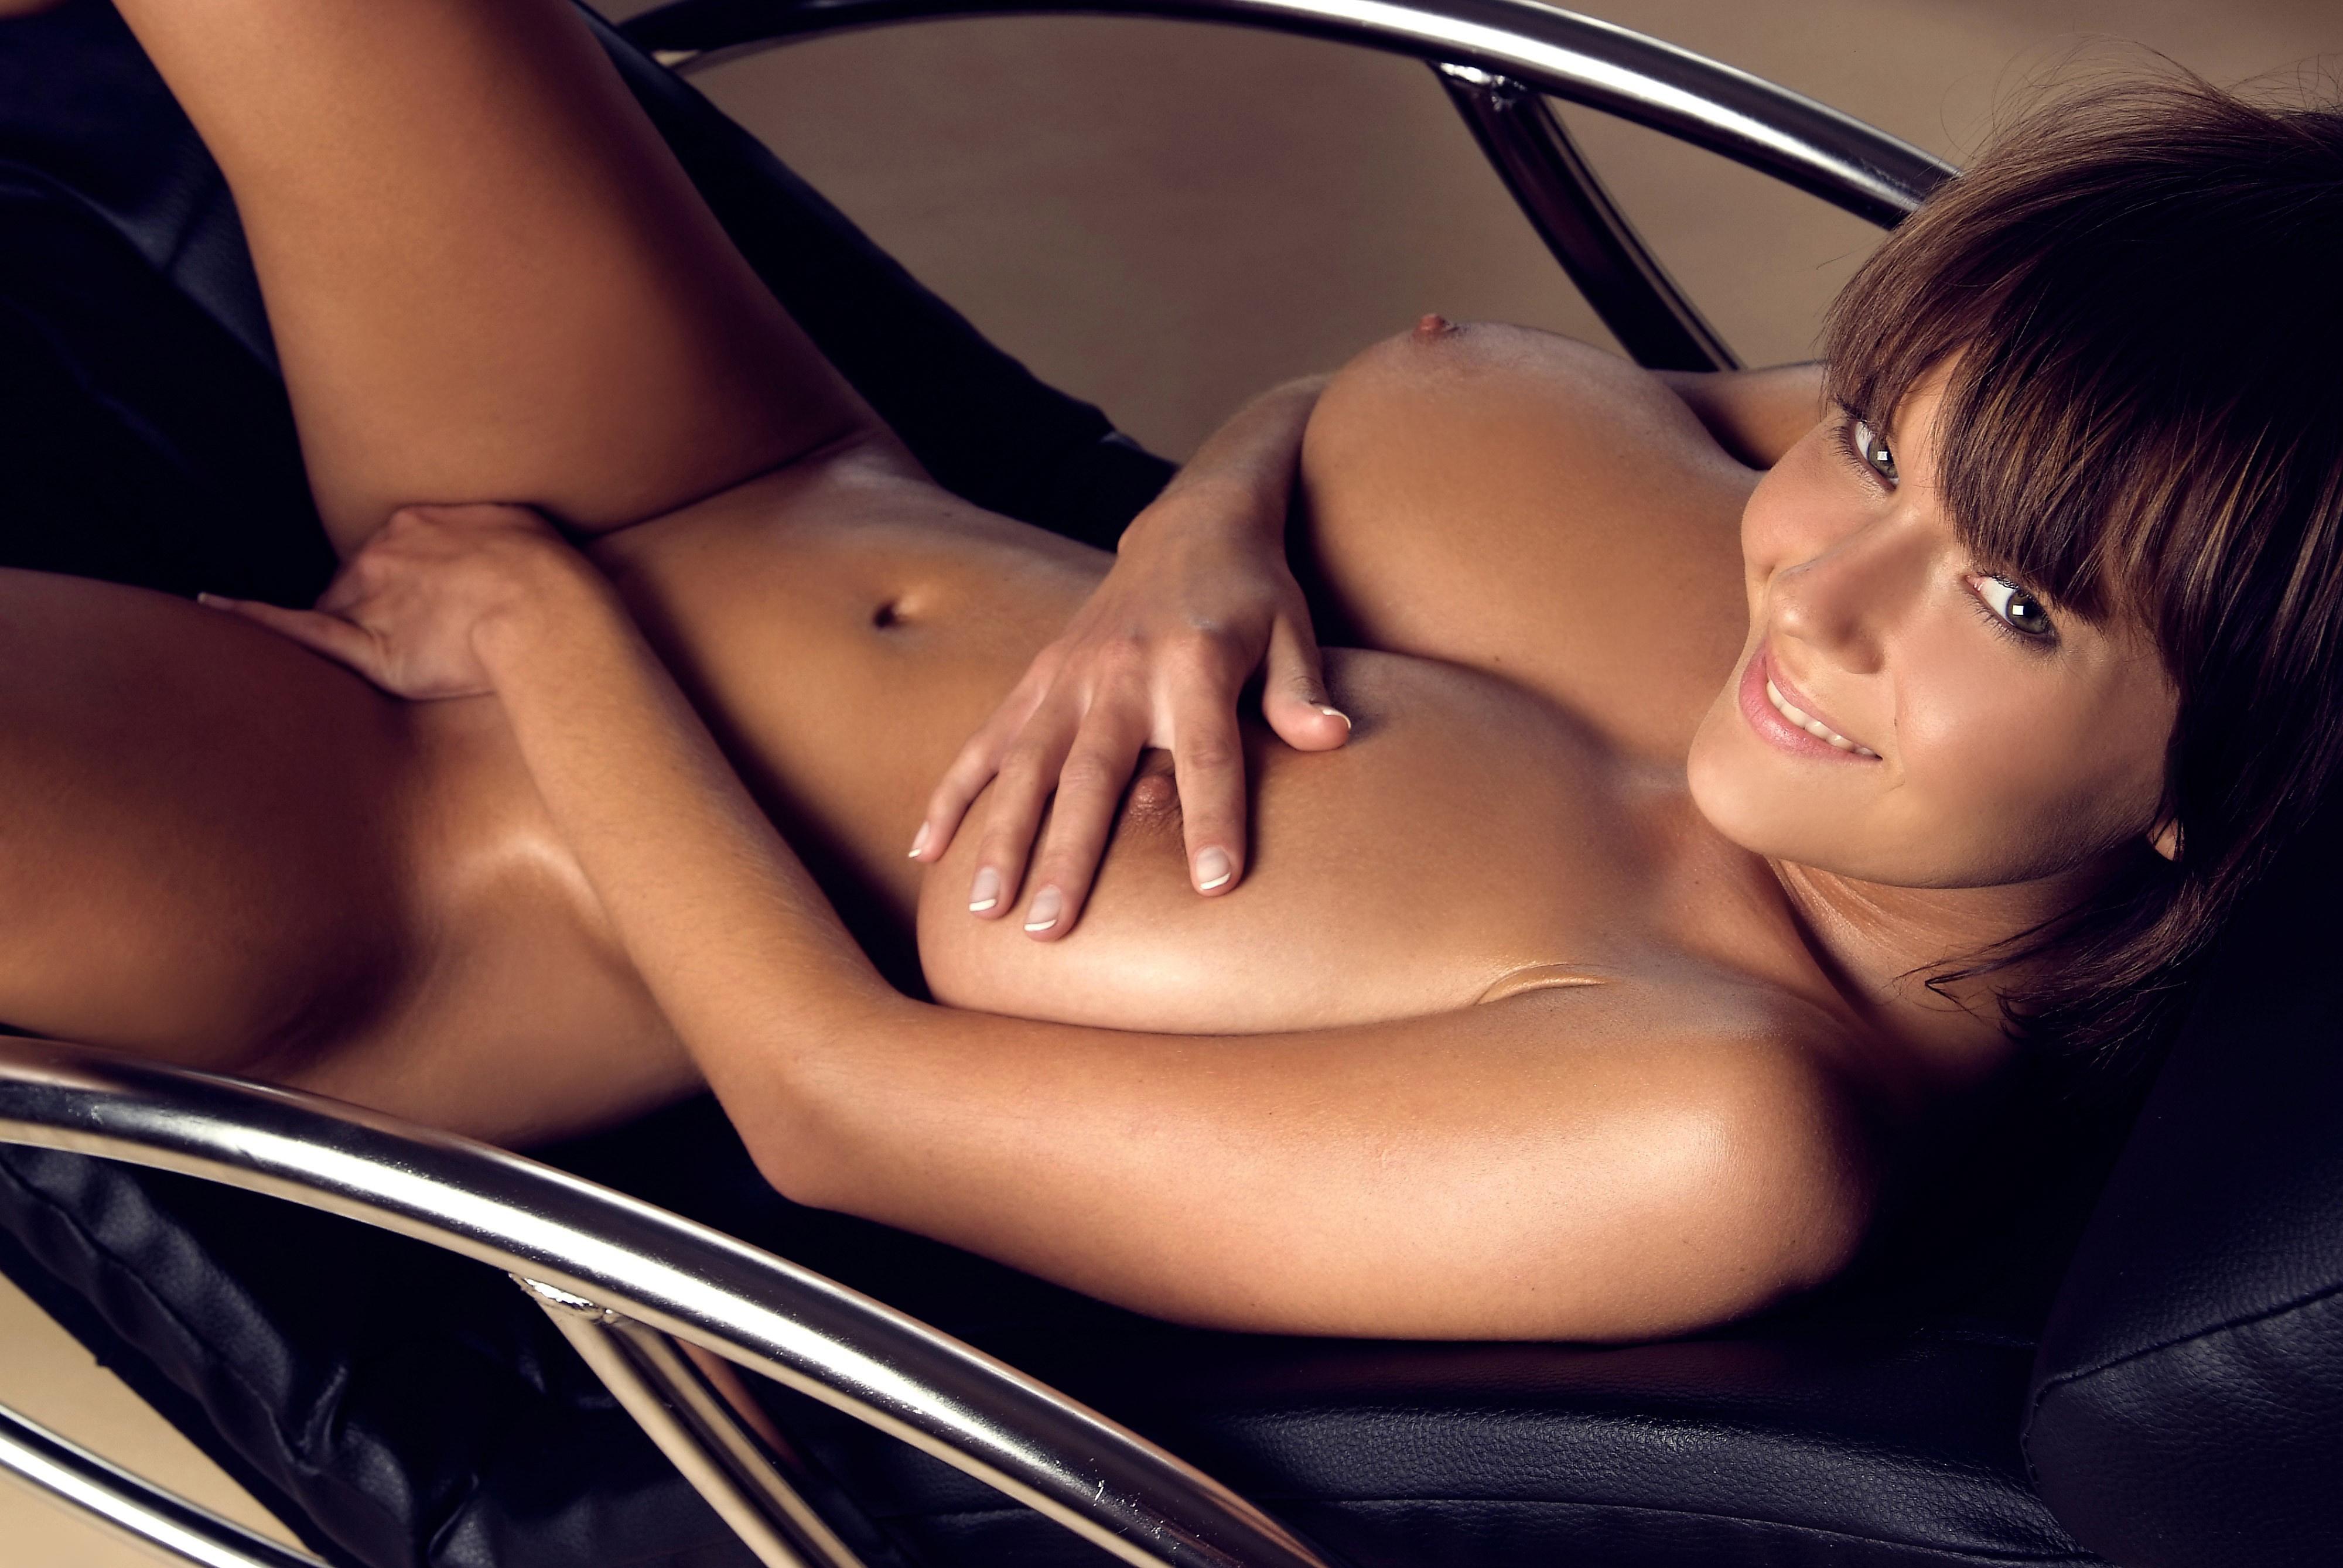 Ala Passtel Porn download 4000x2677 brunette, boobs, naked, smile, gabrielle